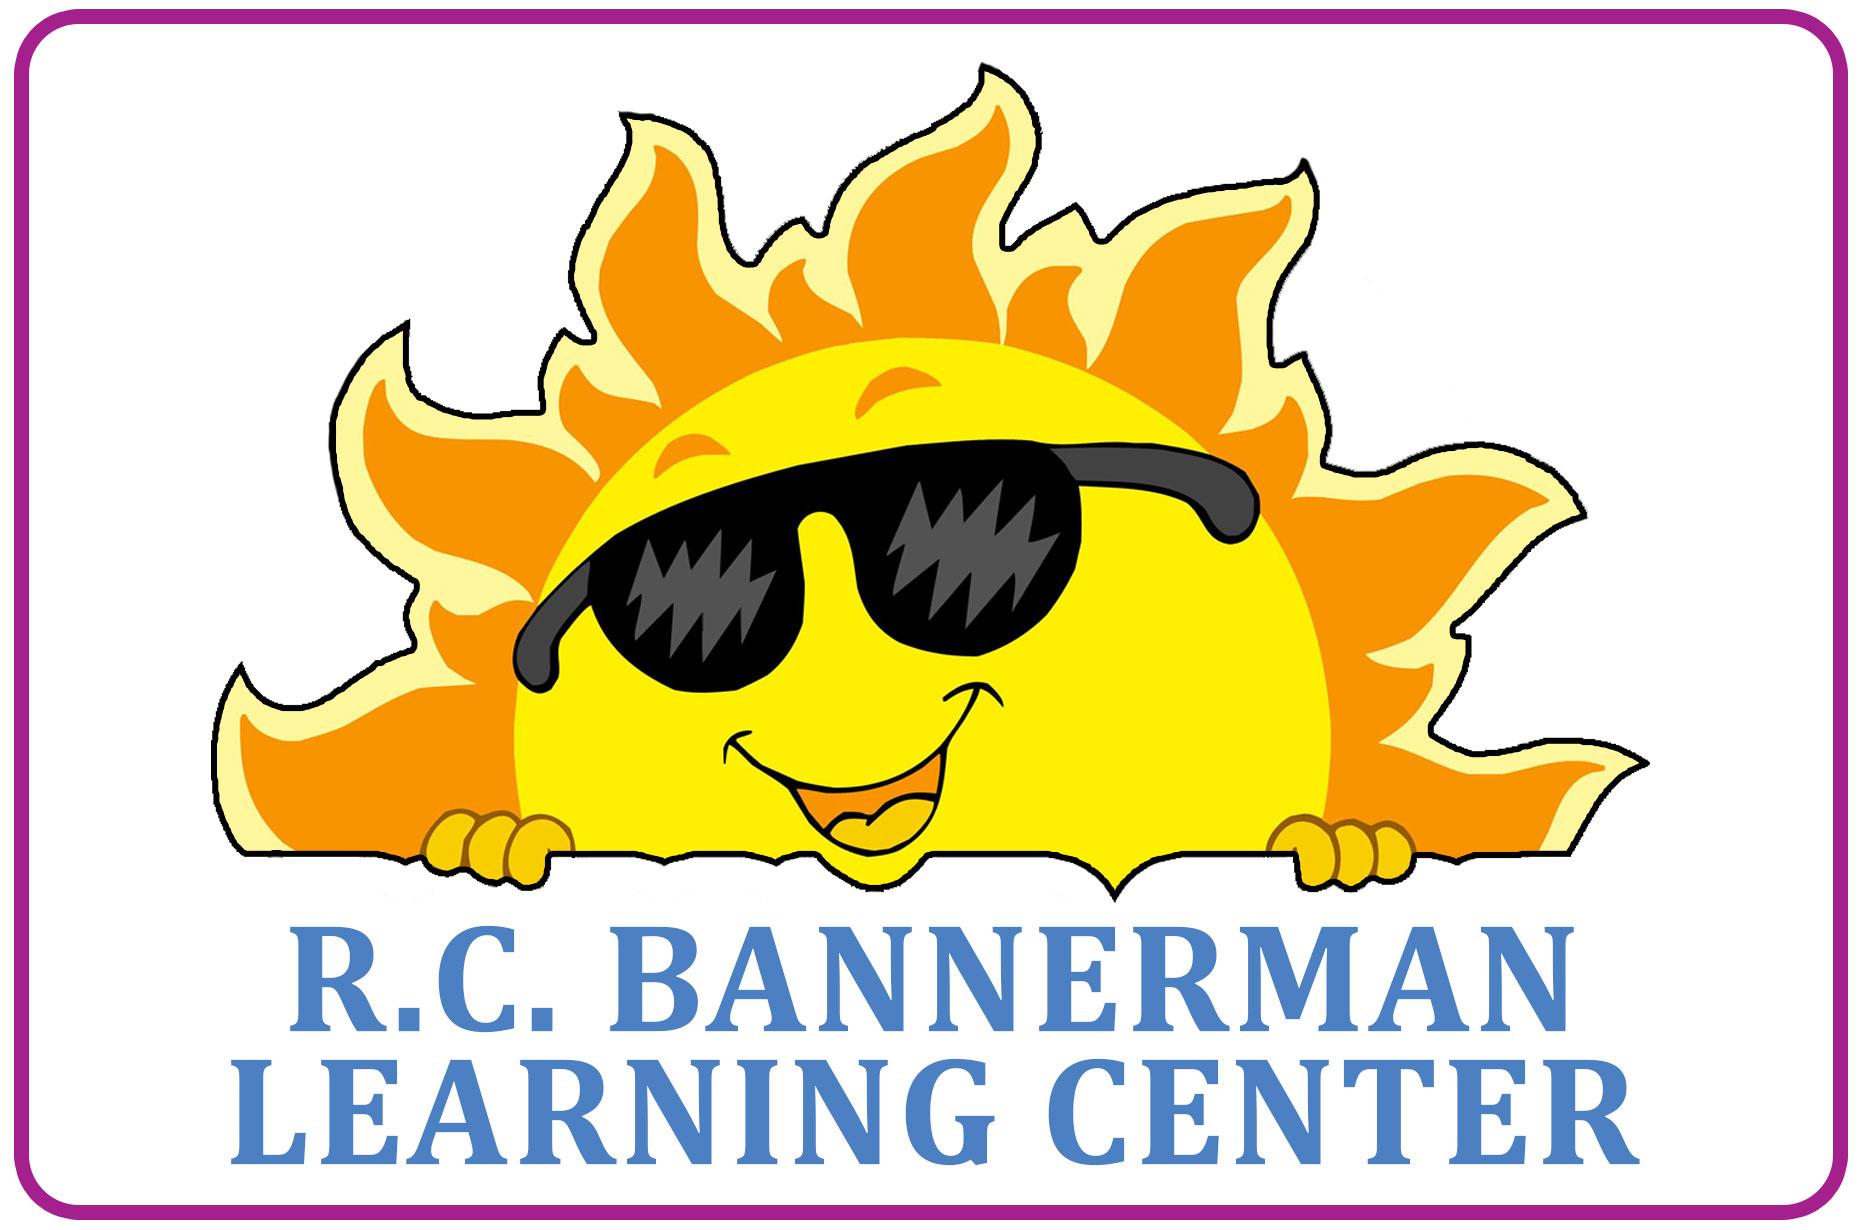 R.C. Bannerman Learning Center